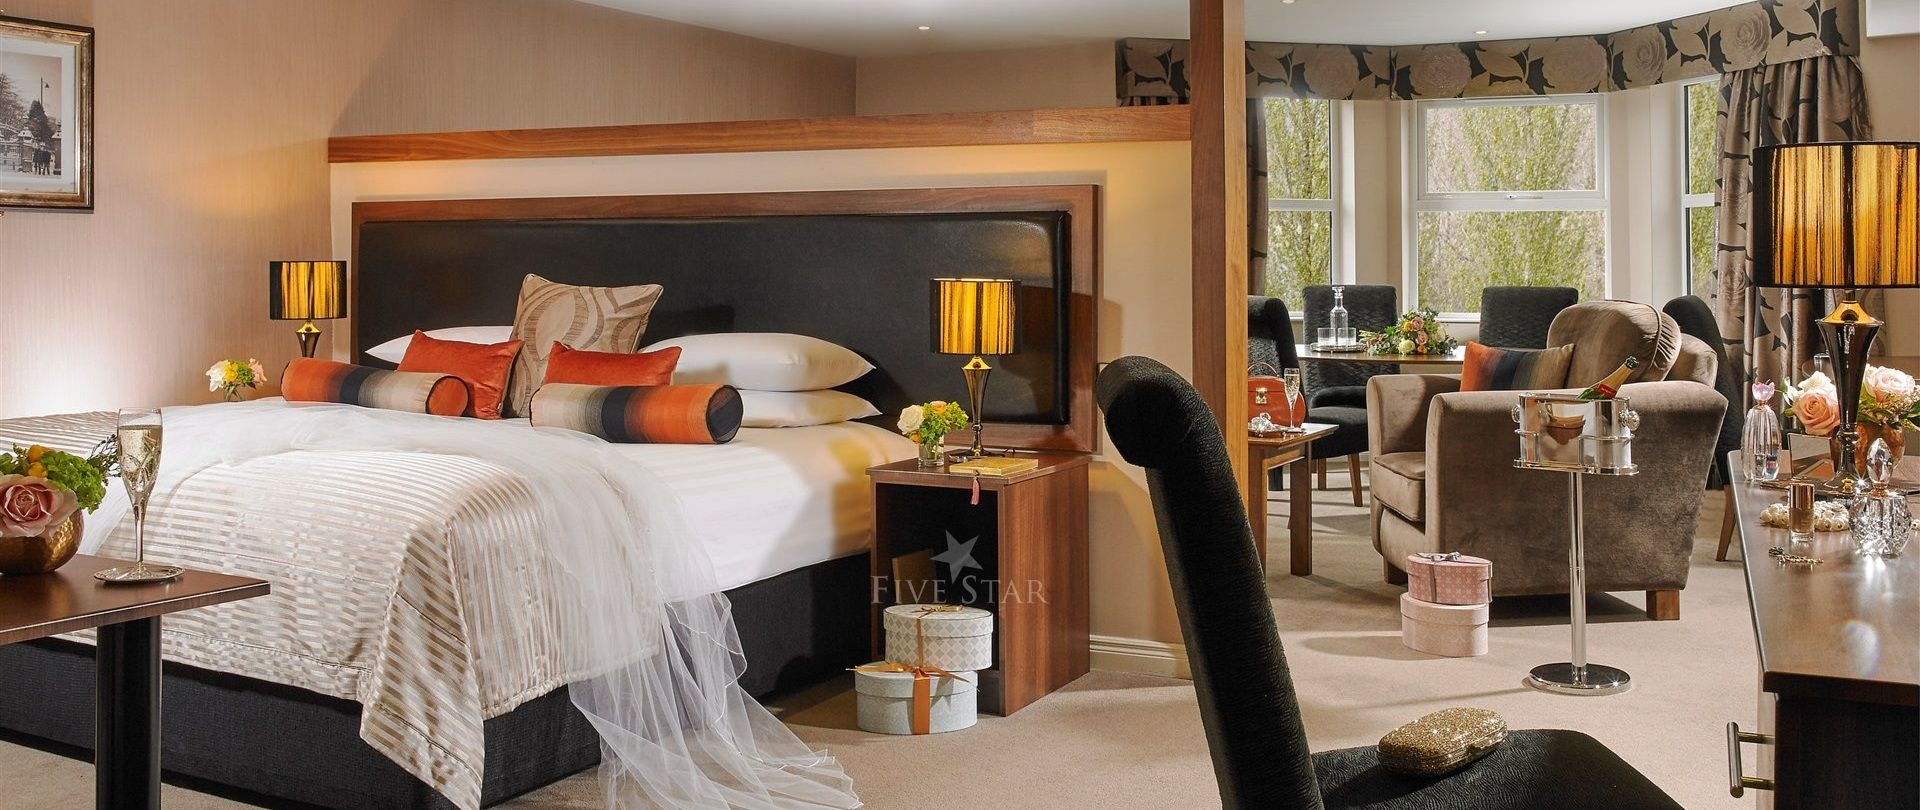 Malone Lodge Hotel & Apartments photo 15